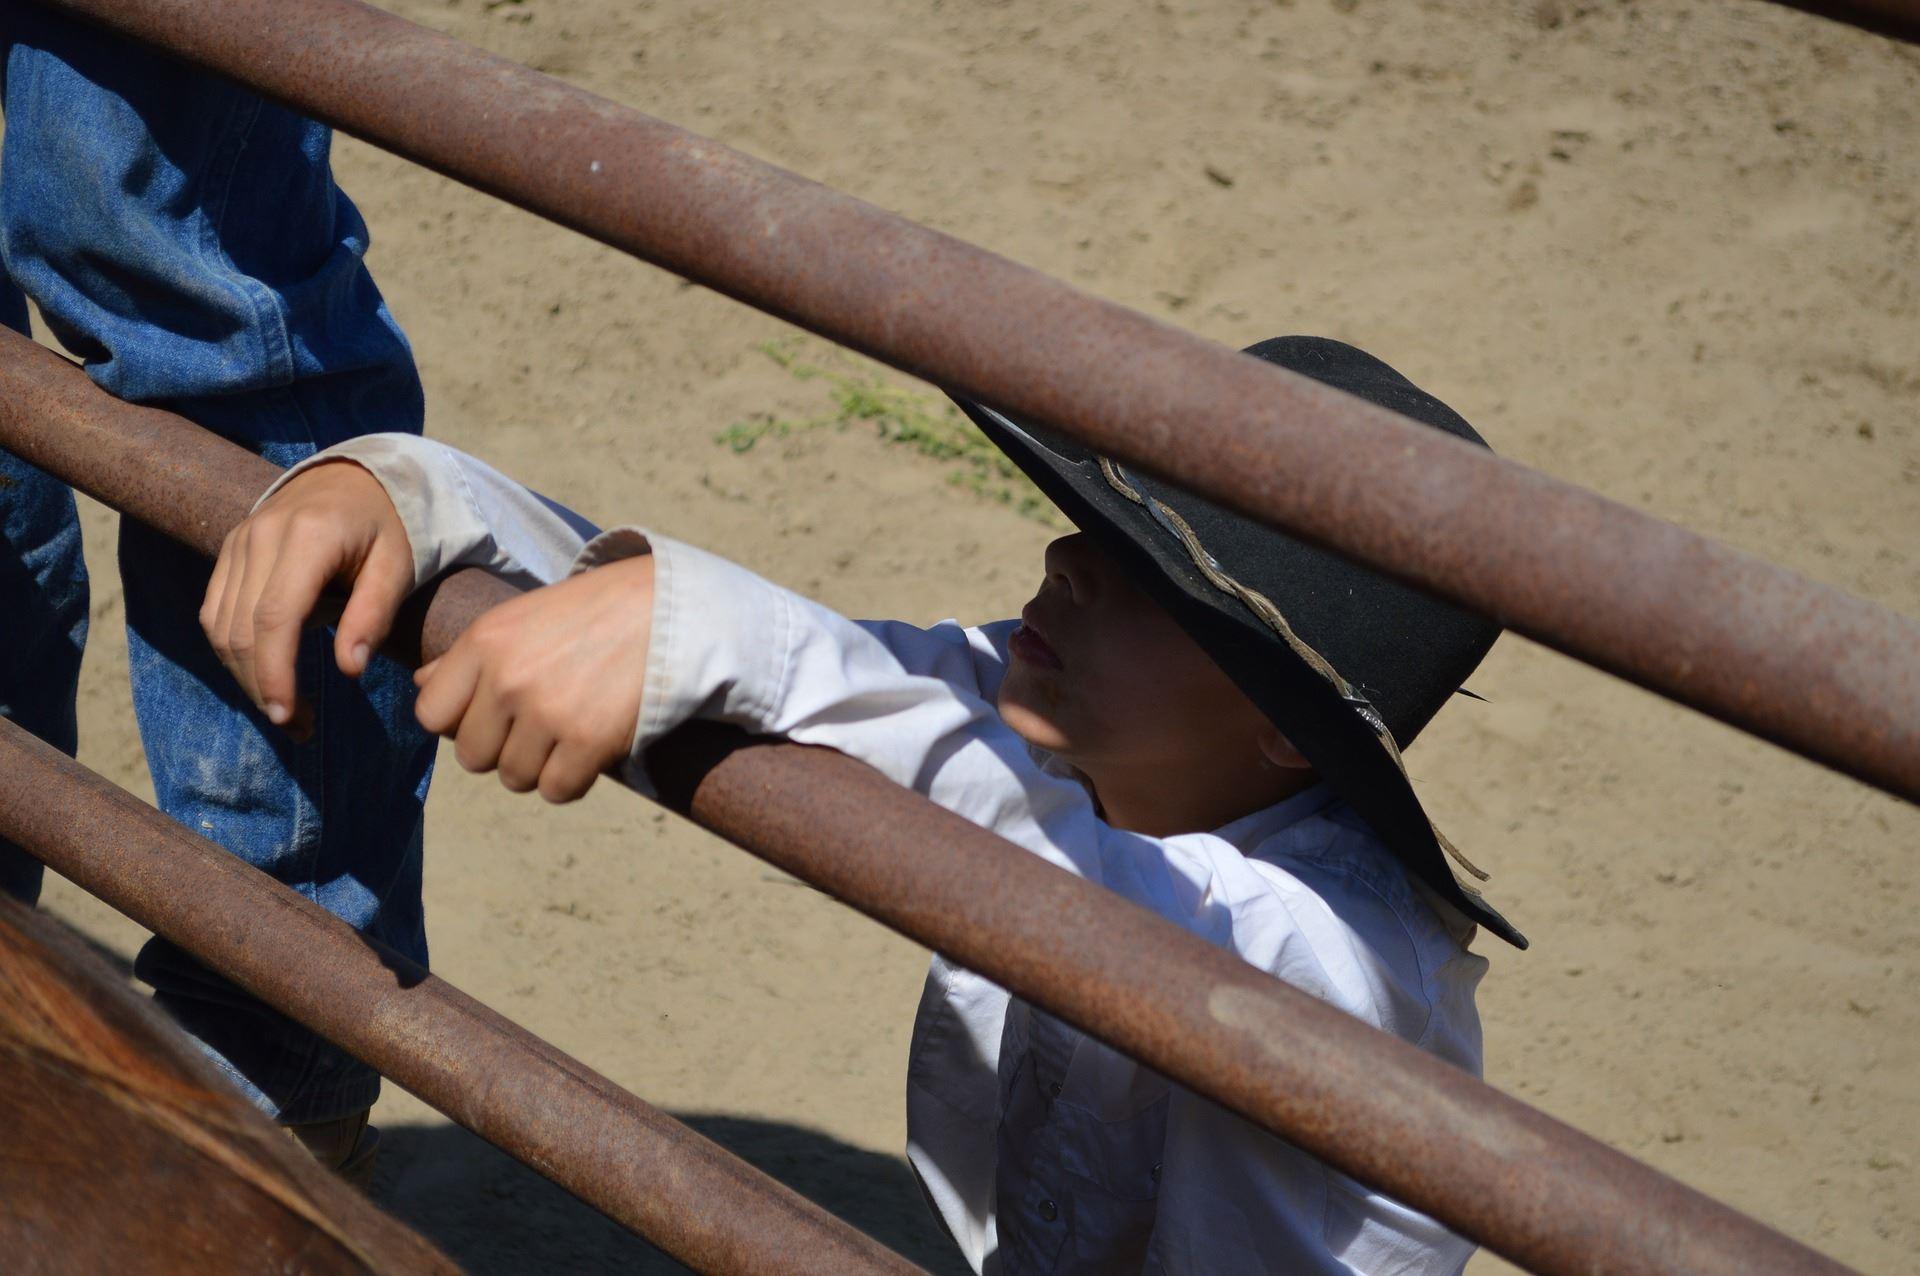 Chute & Barrel Jr. Rodeo Association